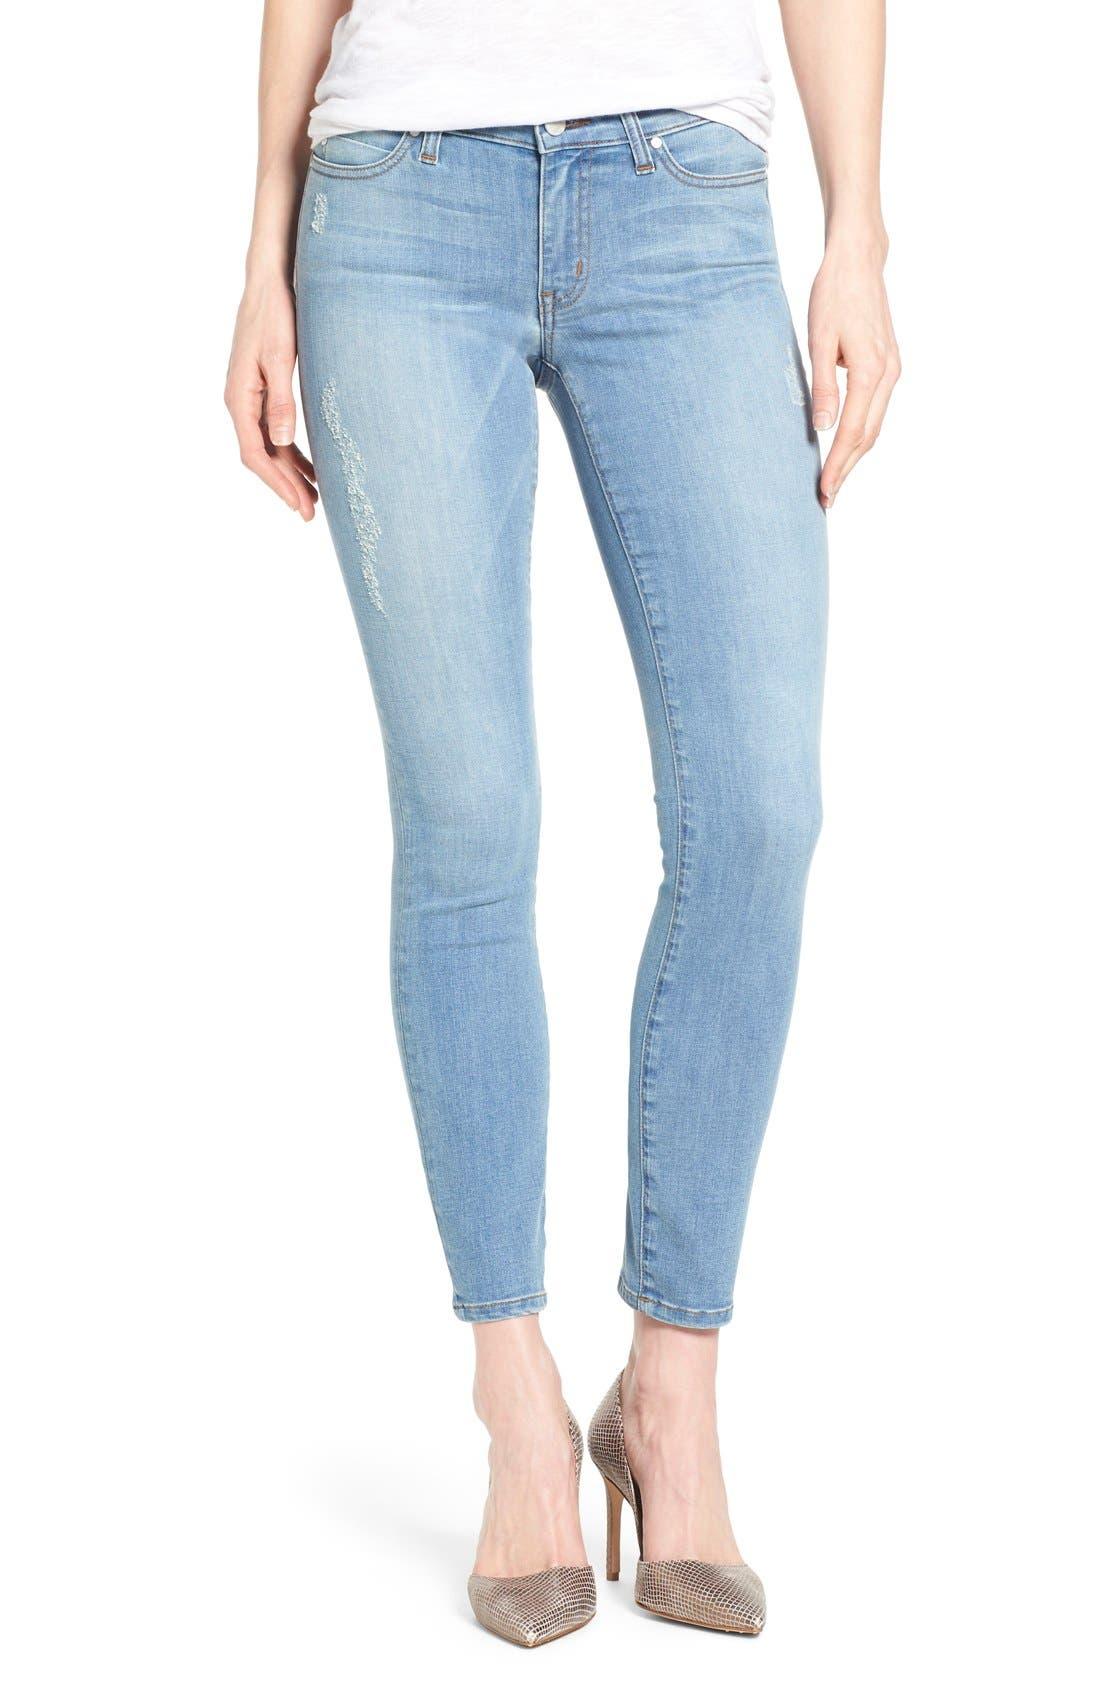 Main Image - Mavi Jeans 'Adriana' Distressed Stretch Skinny Ankle Jeans